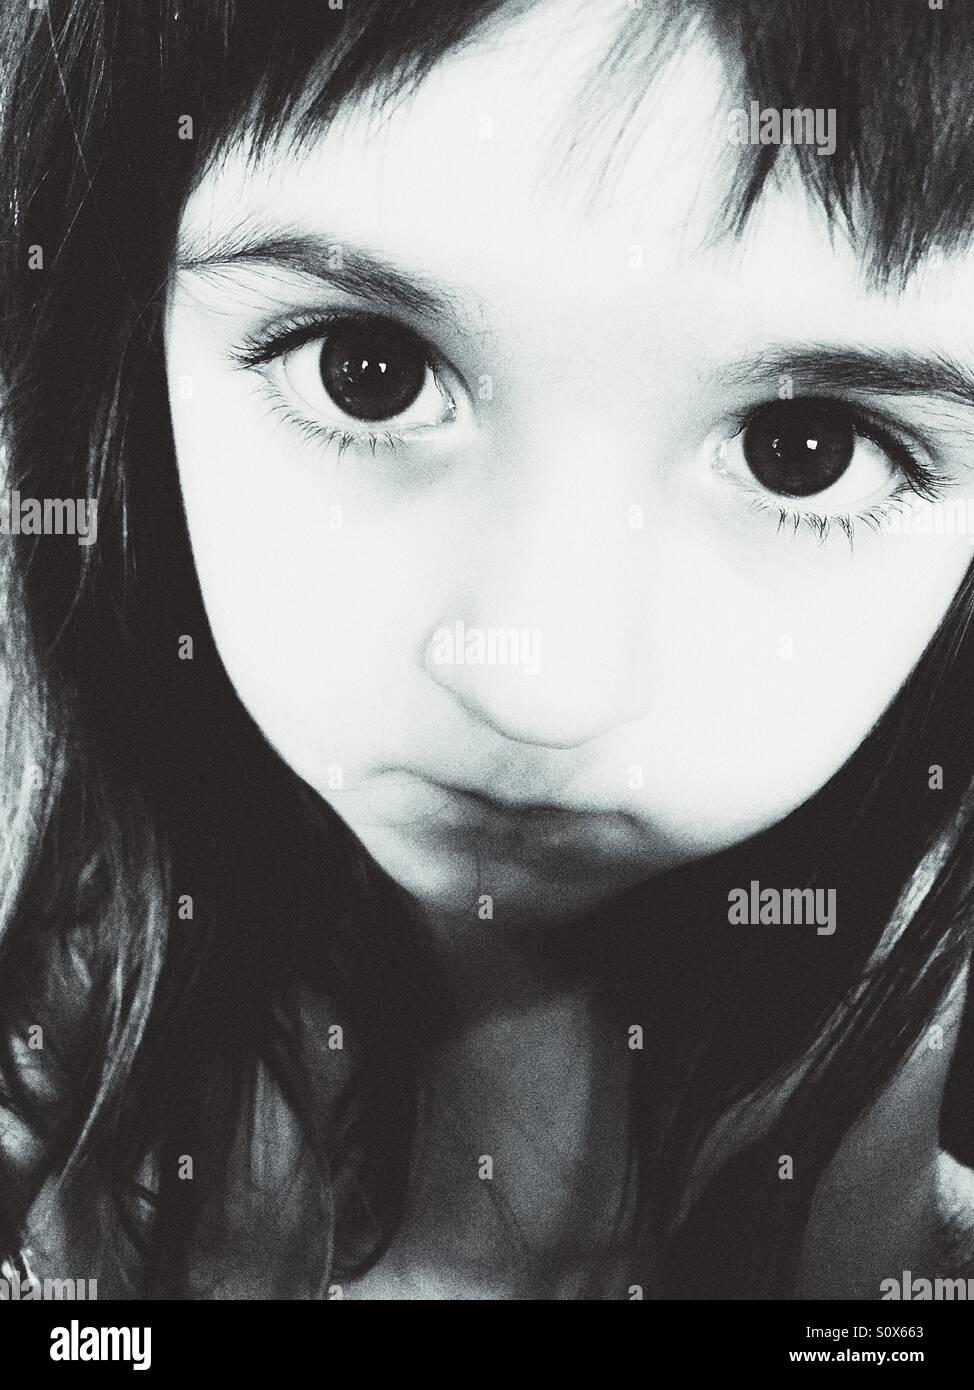 Black and white portrait of Caucasian girl. - Stock Image